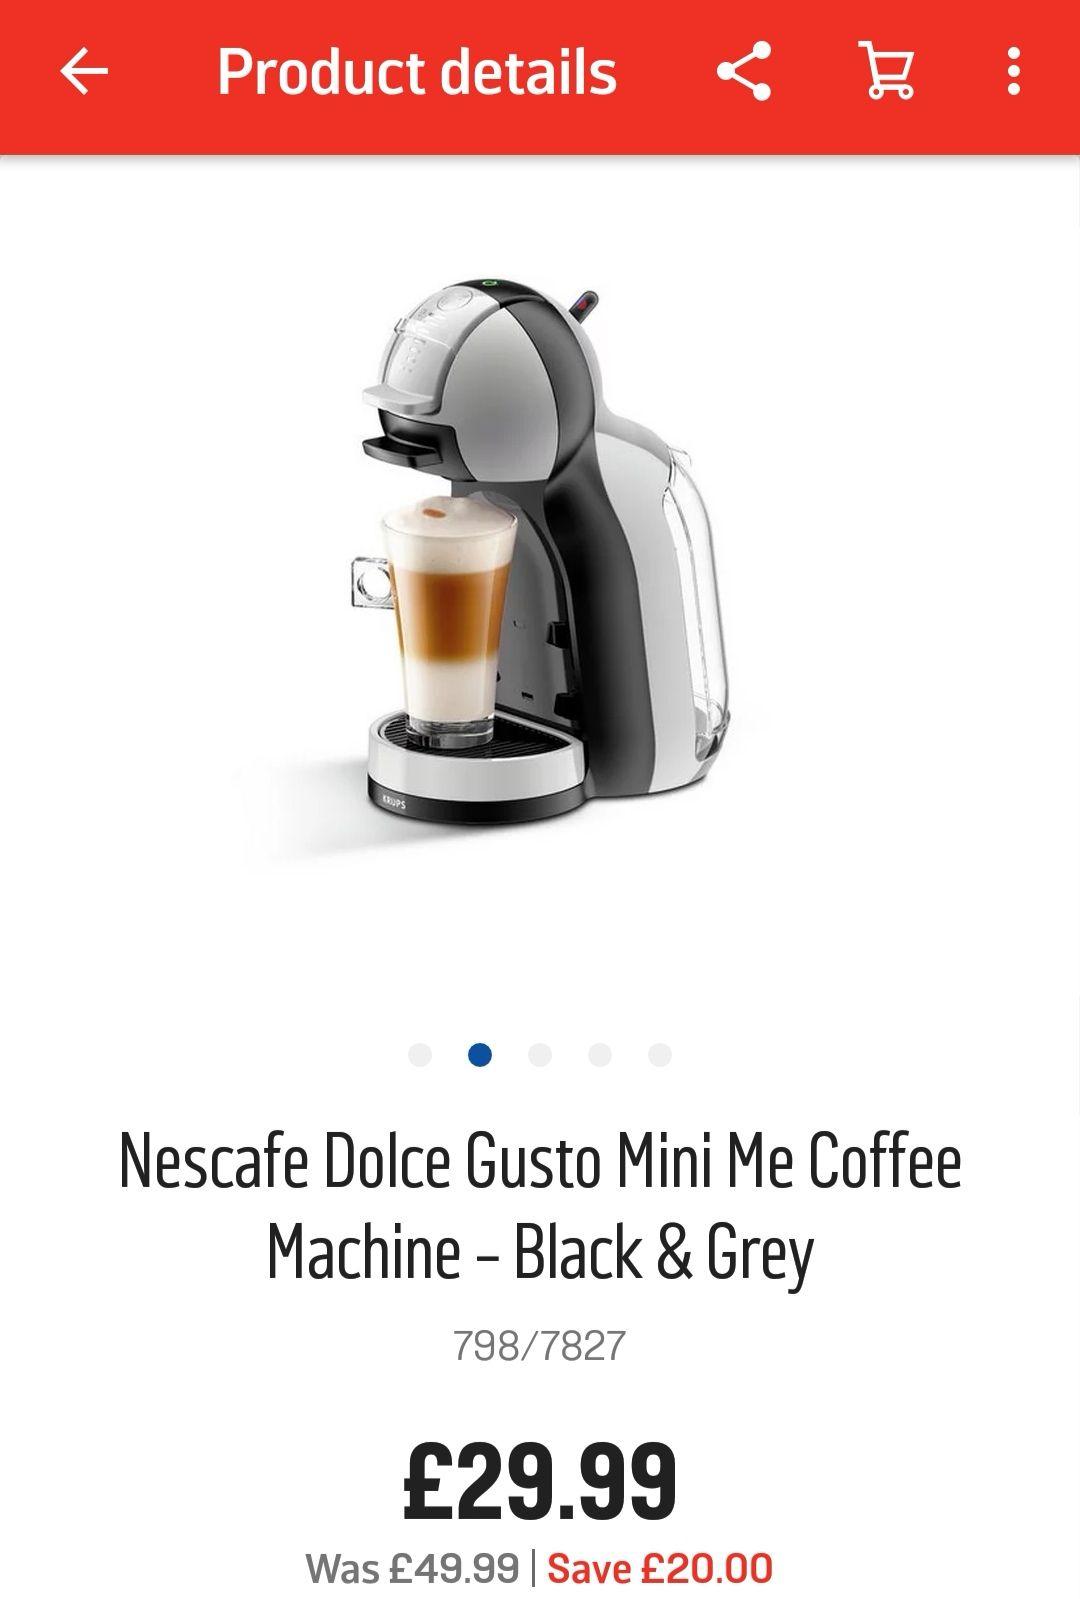 Nescafe Dolce Gusto Mini Me Coffee Machine - Black & Greyby NESCAFE Dolce Gusto by KRUPS - £29.99 @ Argos (free C&C)